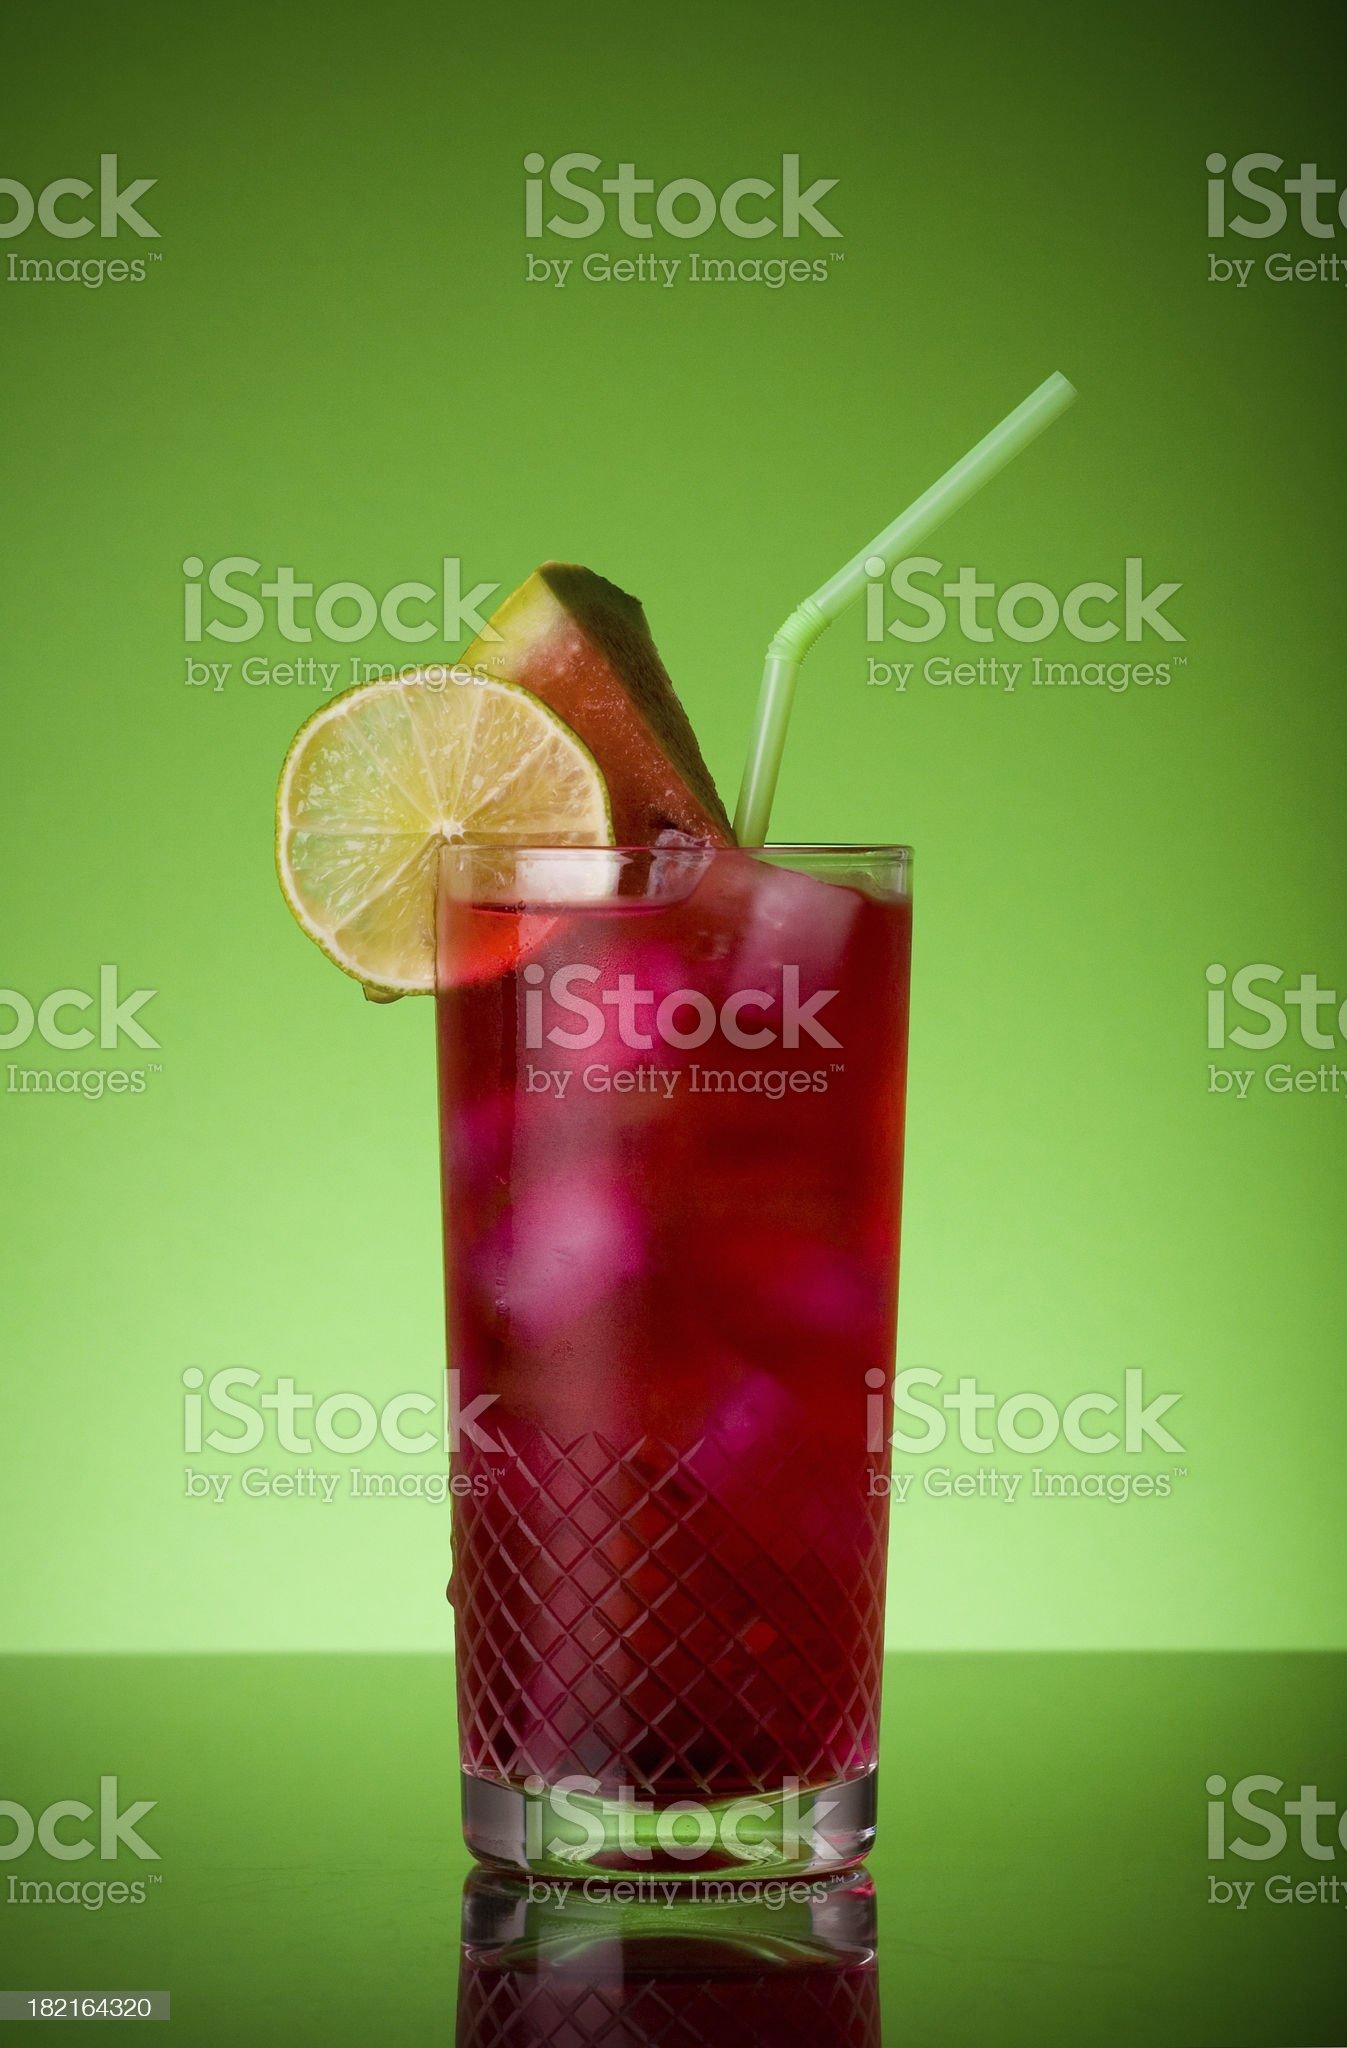 Classy drink royalty-free stock photo